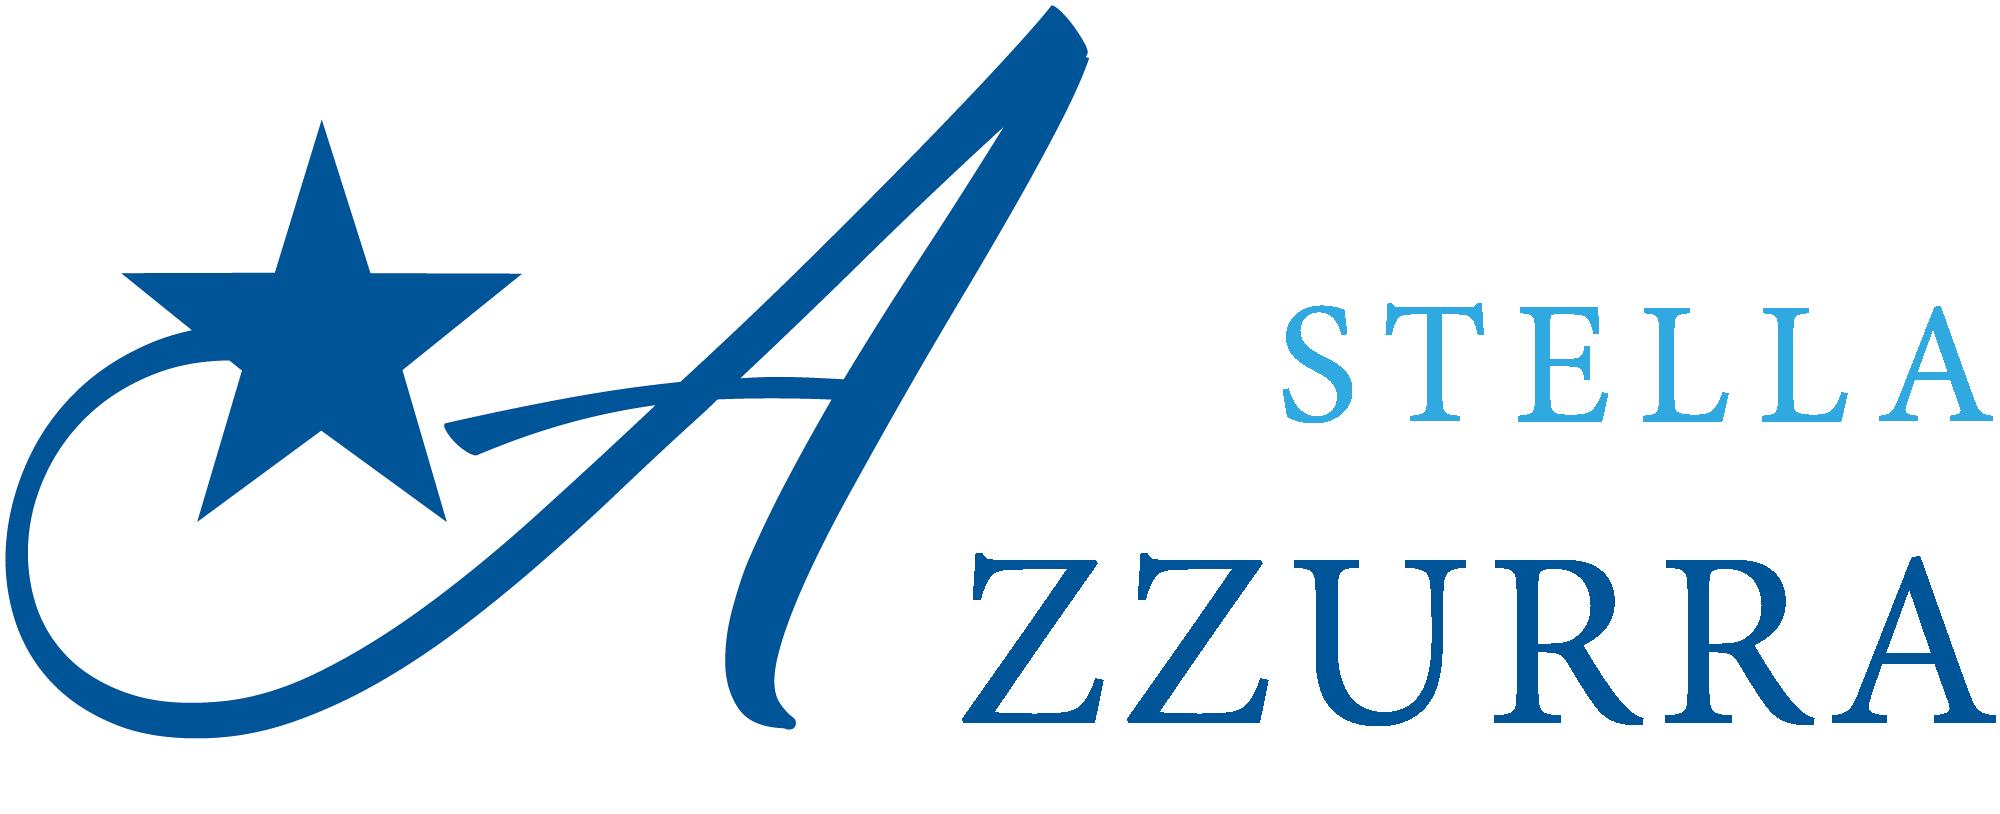 Cooperativa Stella Azzurra